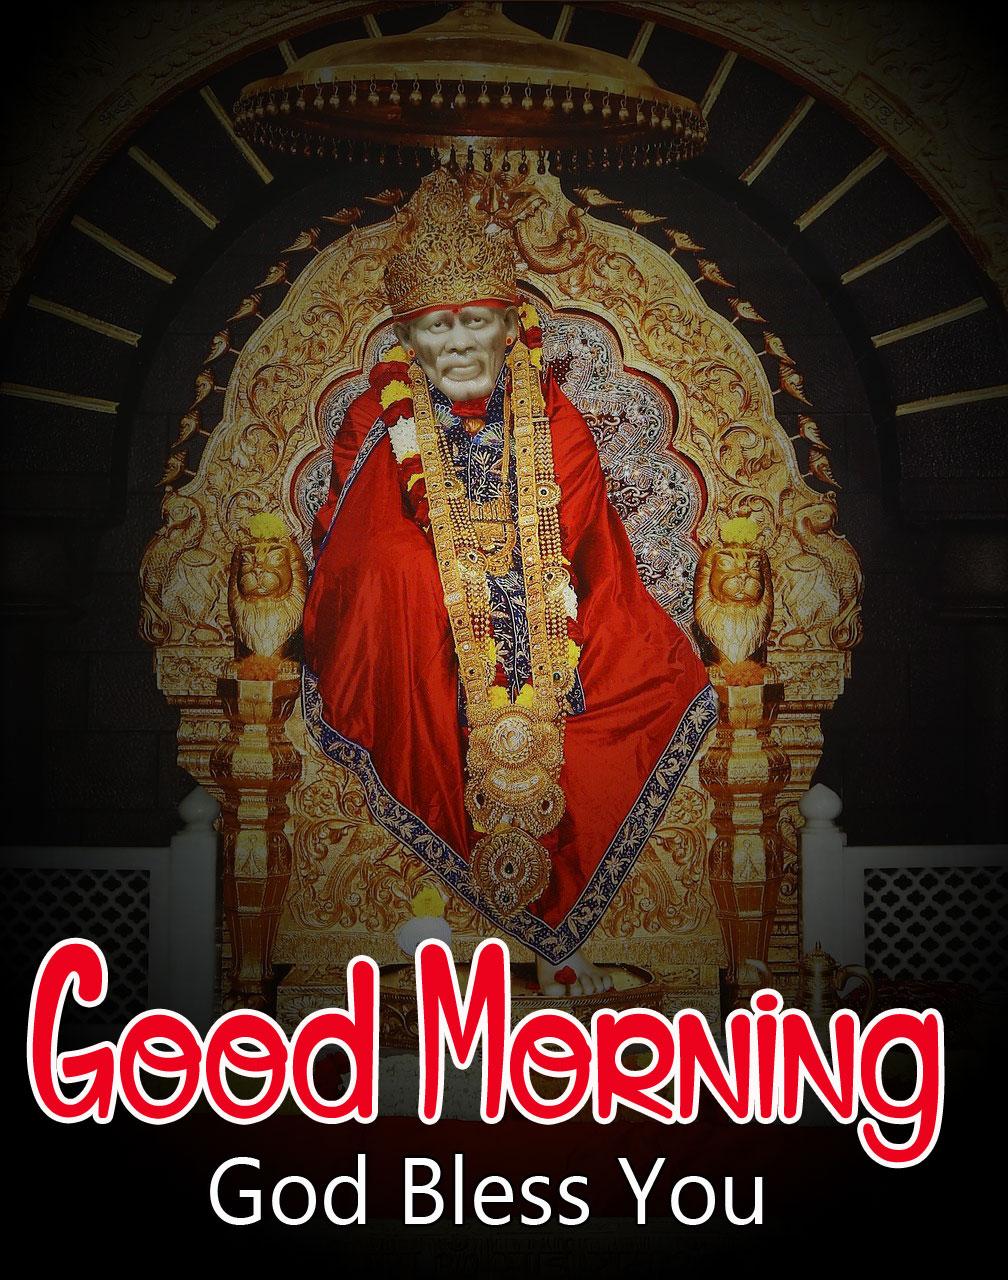 Latest Sai Baba Good Morning Images pics 2021 2